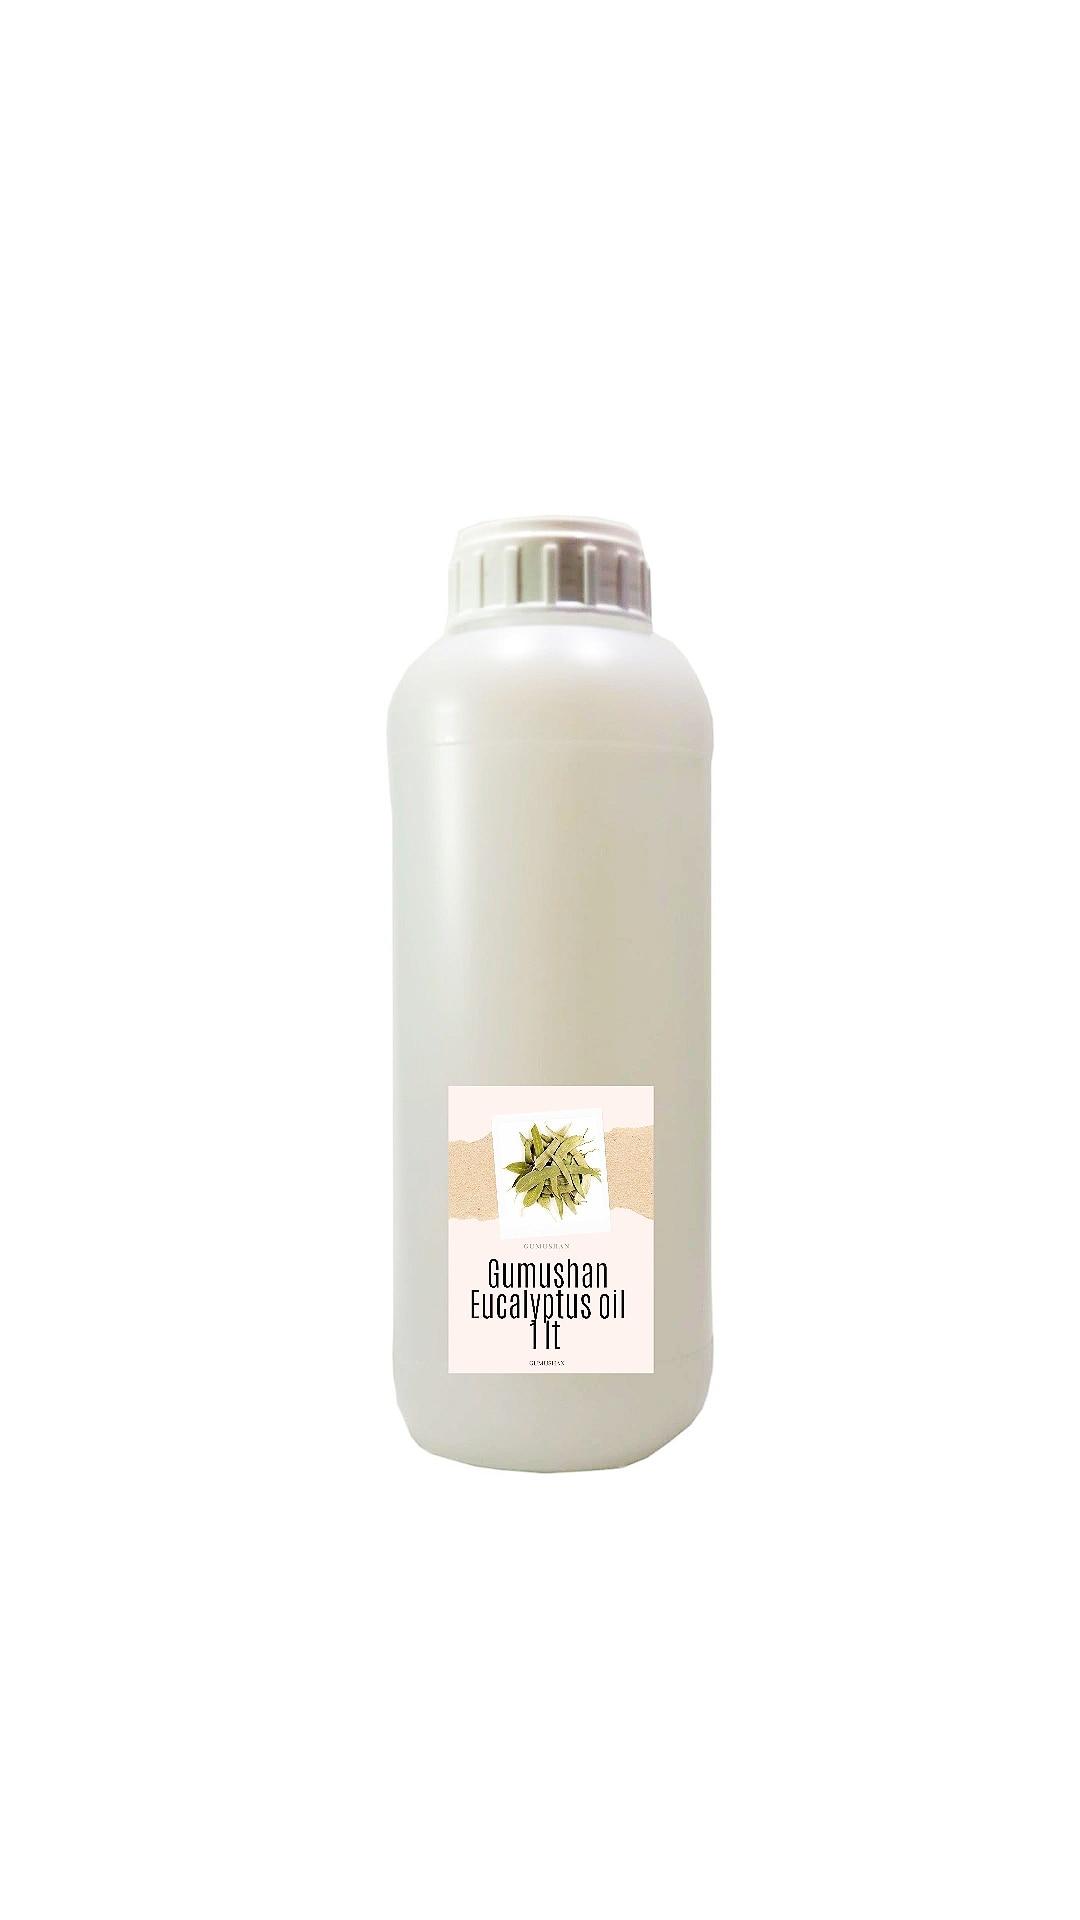 High quality pure Eucalyptus Oil 1 liter 34 fl oz 1000ml